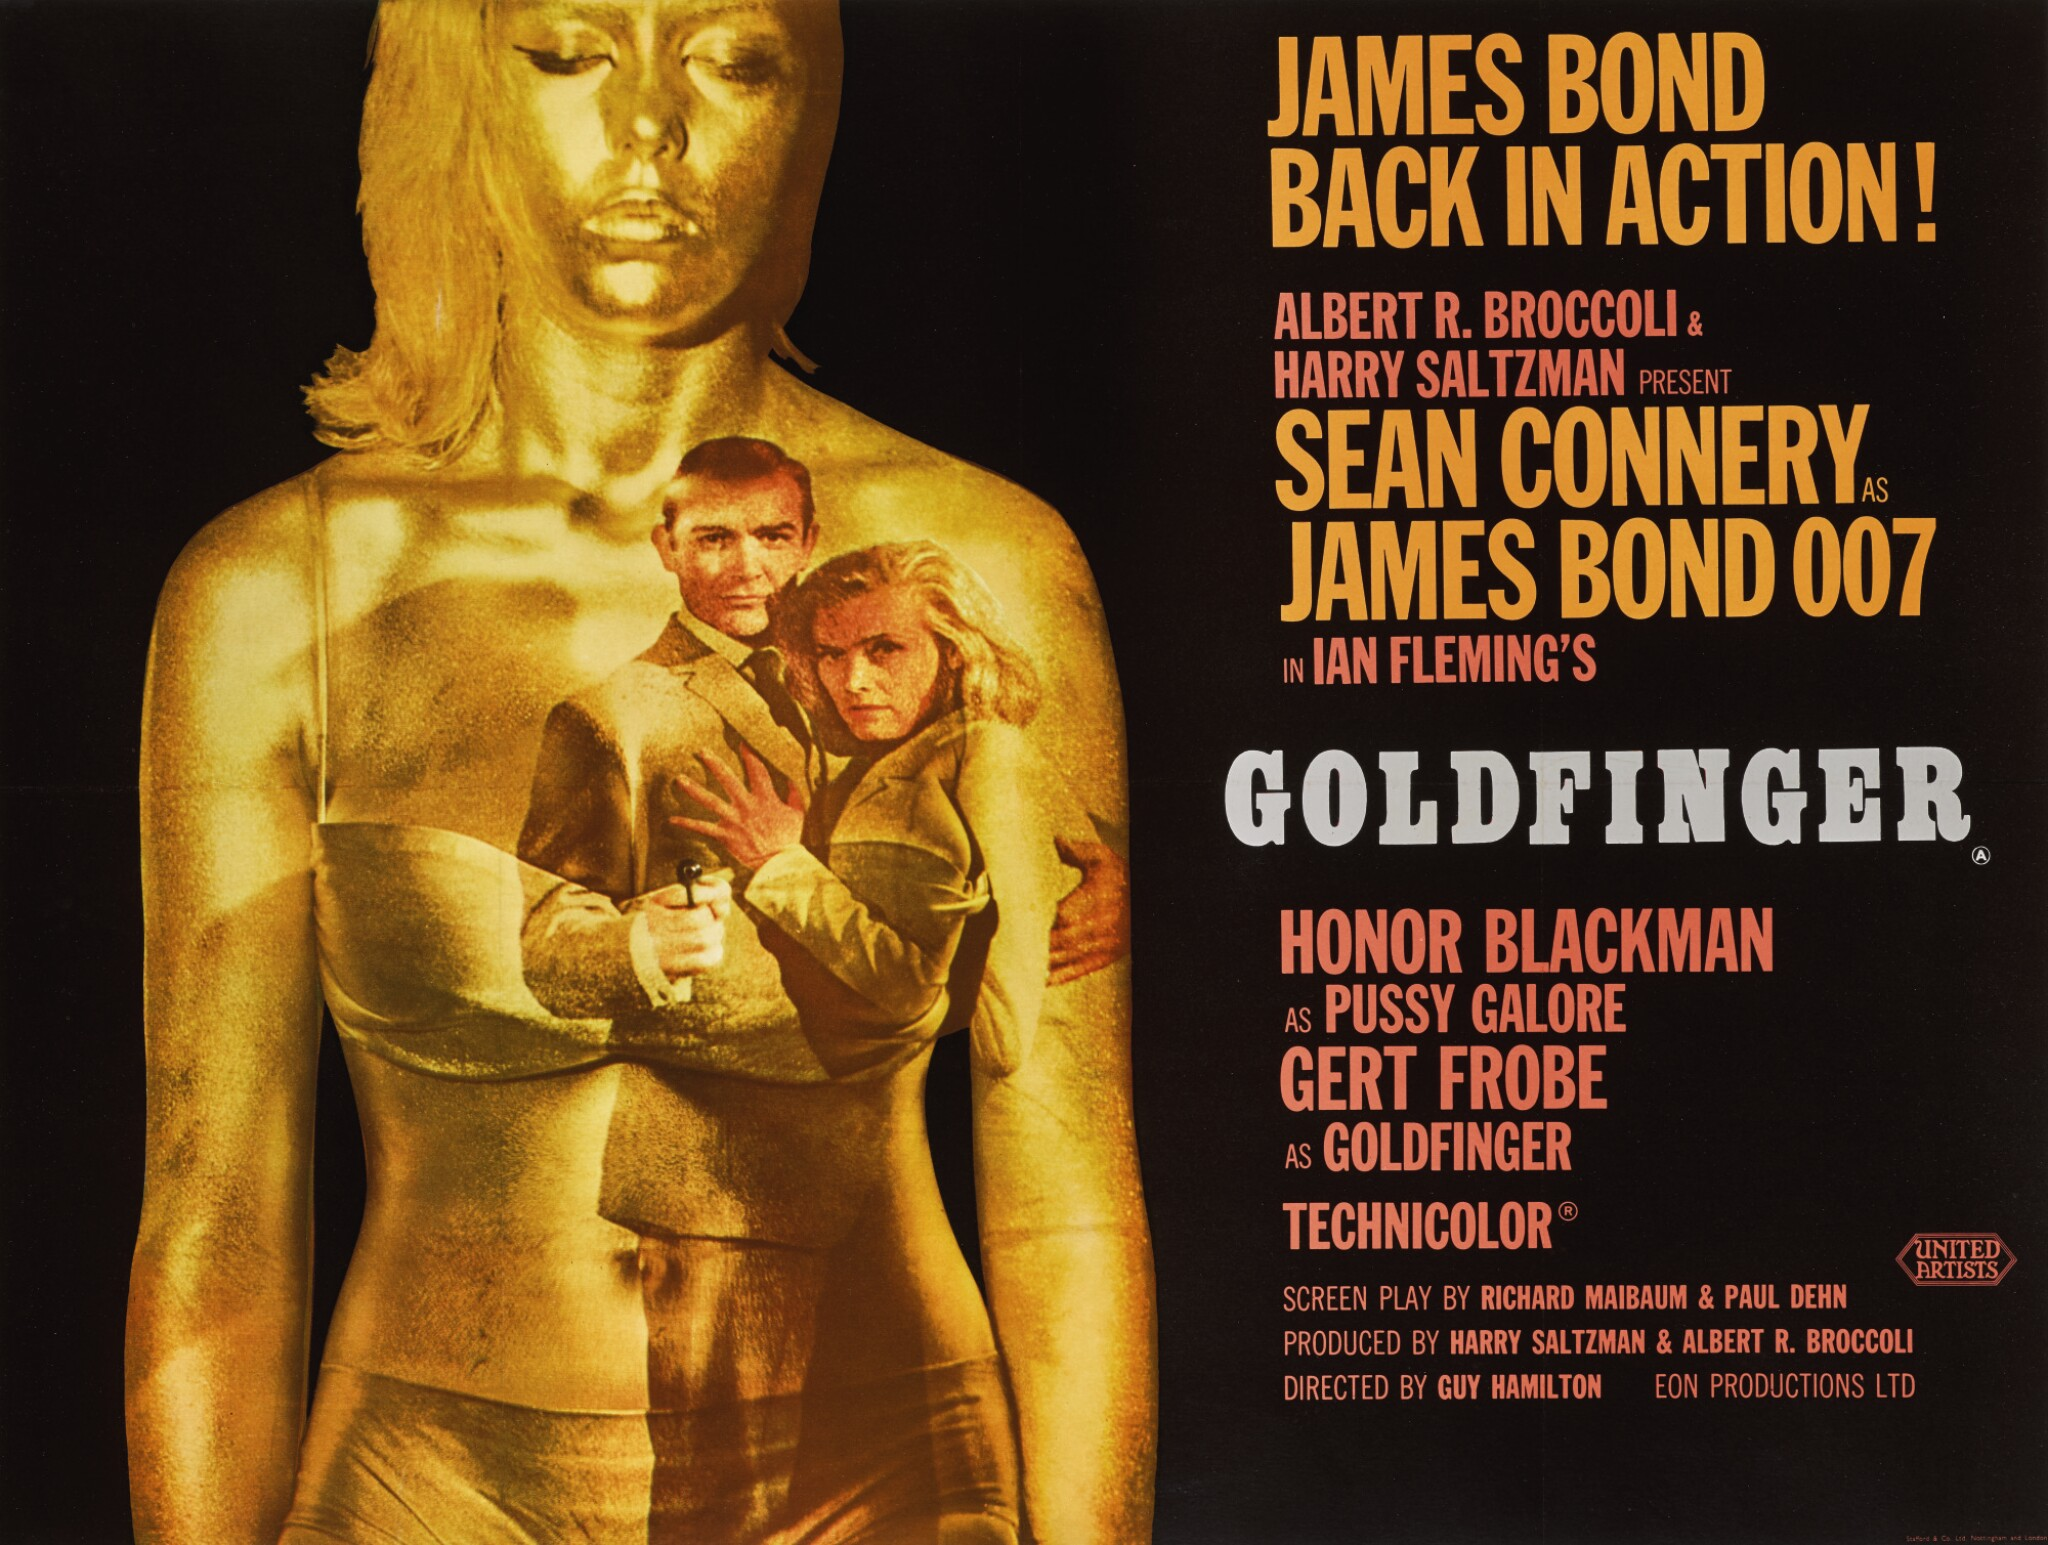 GOLDFINGER (1964) POSTER, BRITISH   Original Film Posters Online    Collectibles   Sotheby's